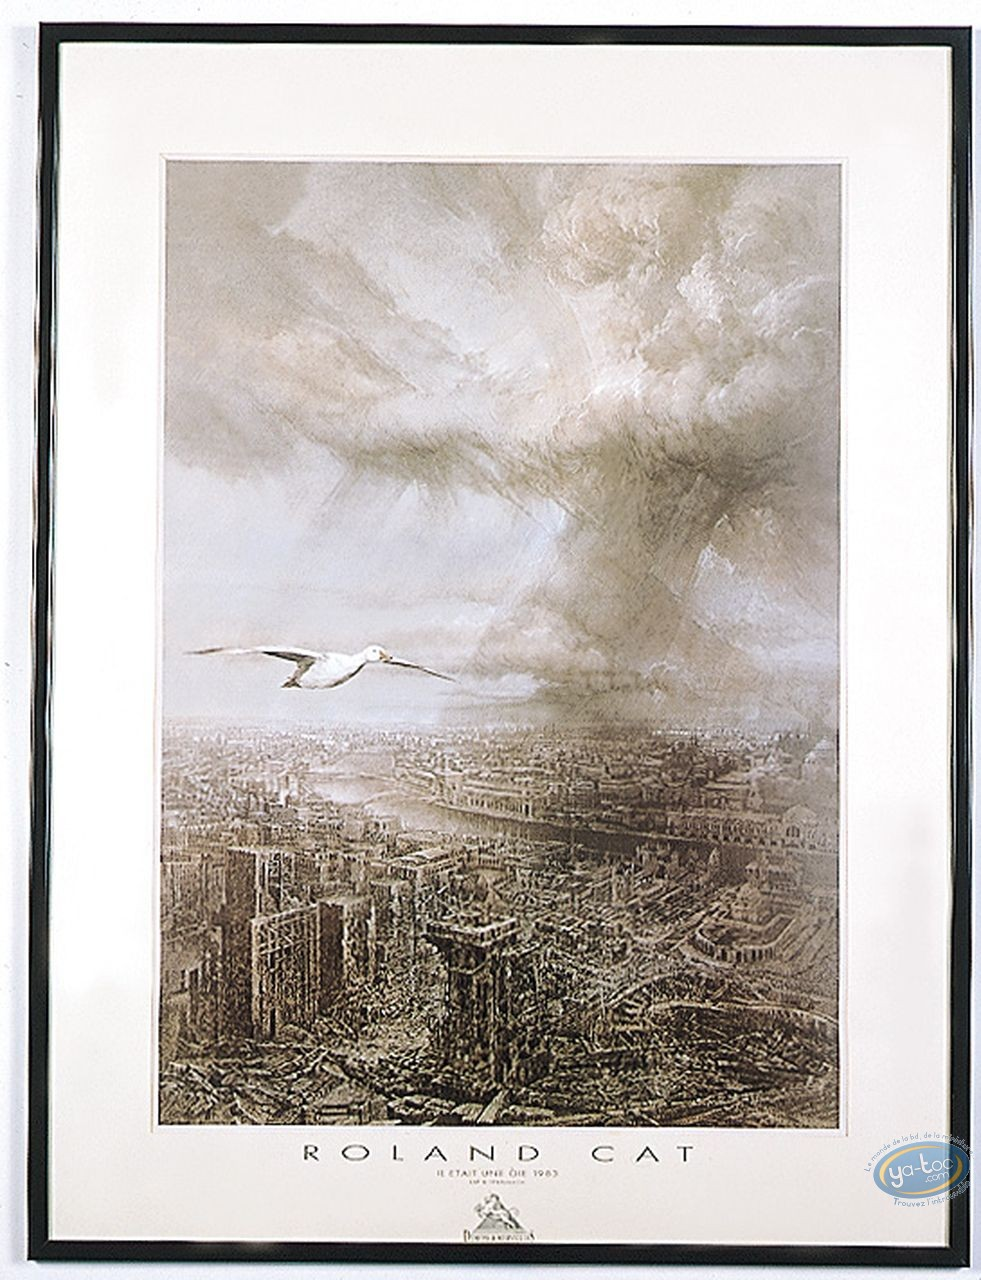 Offset Print, Roland Cat : Stork